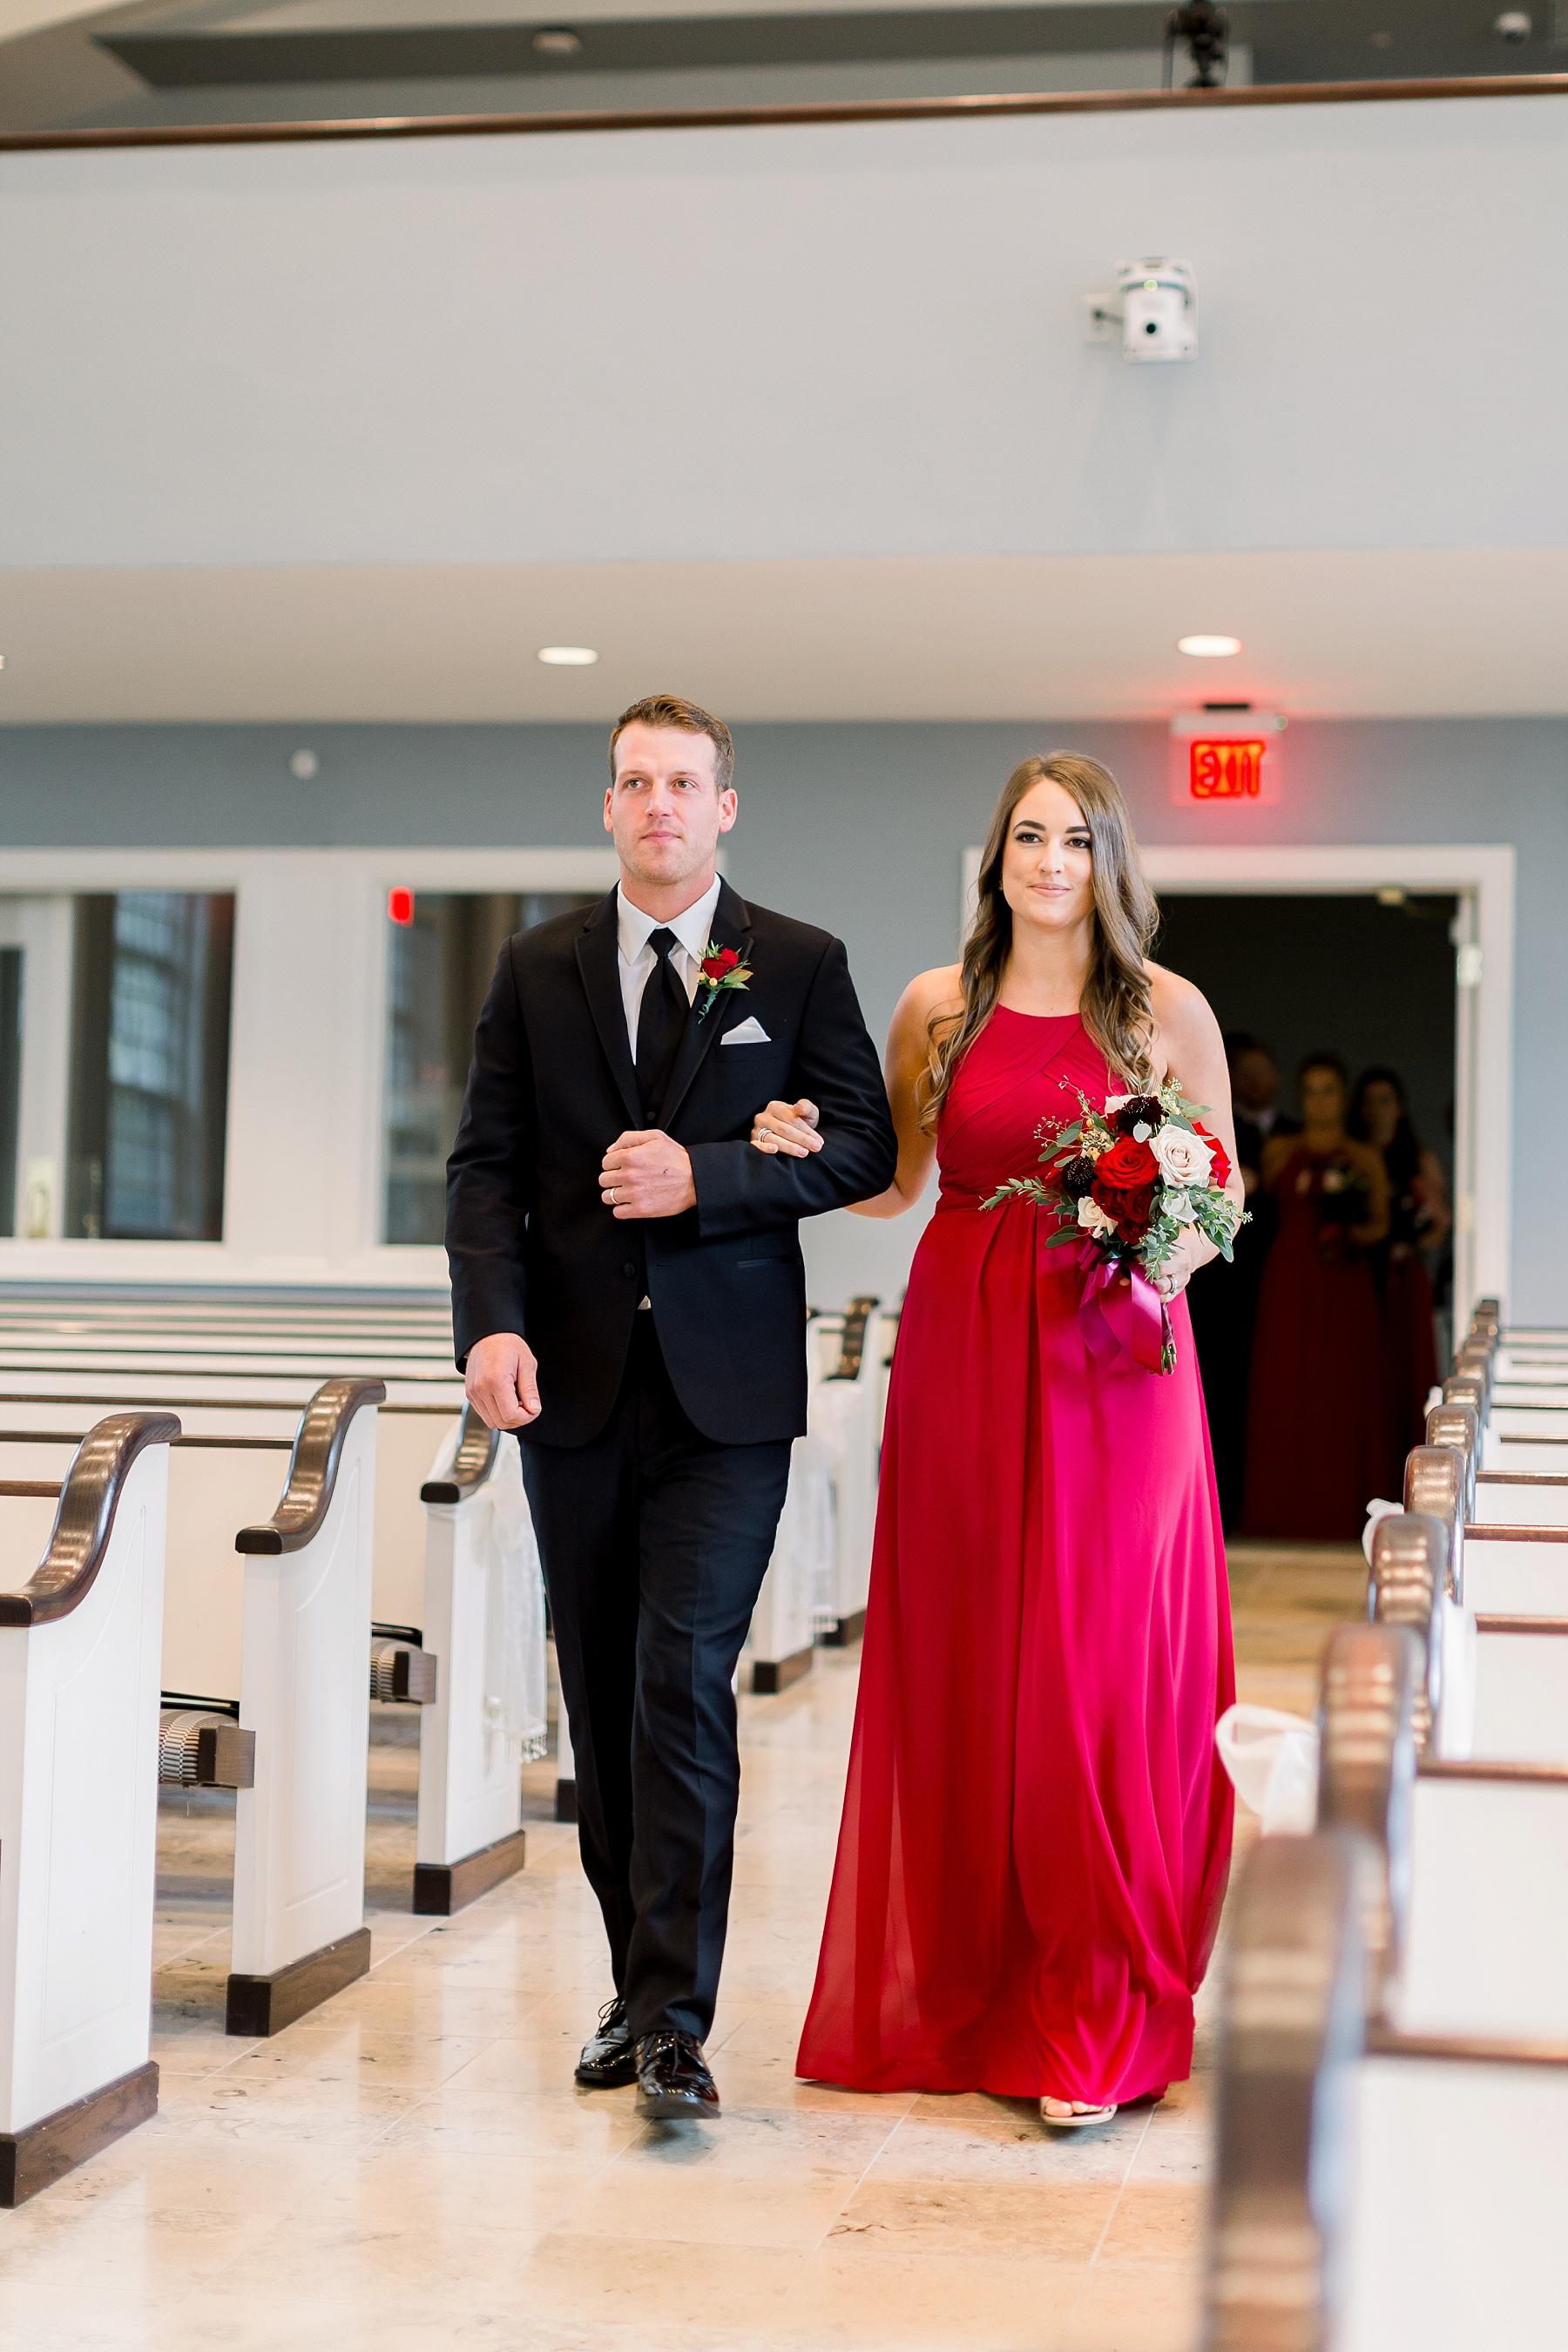 midwest-adventurous-wedding-photographer-elizabeth-ladean-photography-photo_4749.jpg